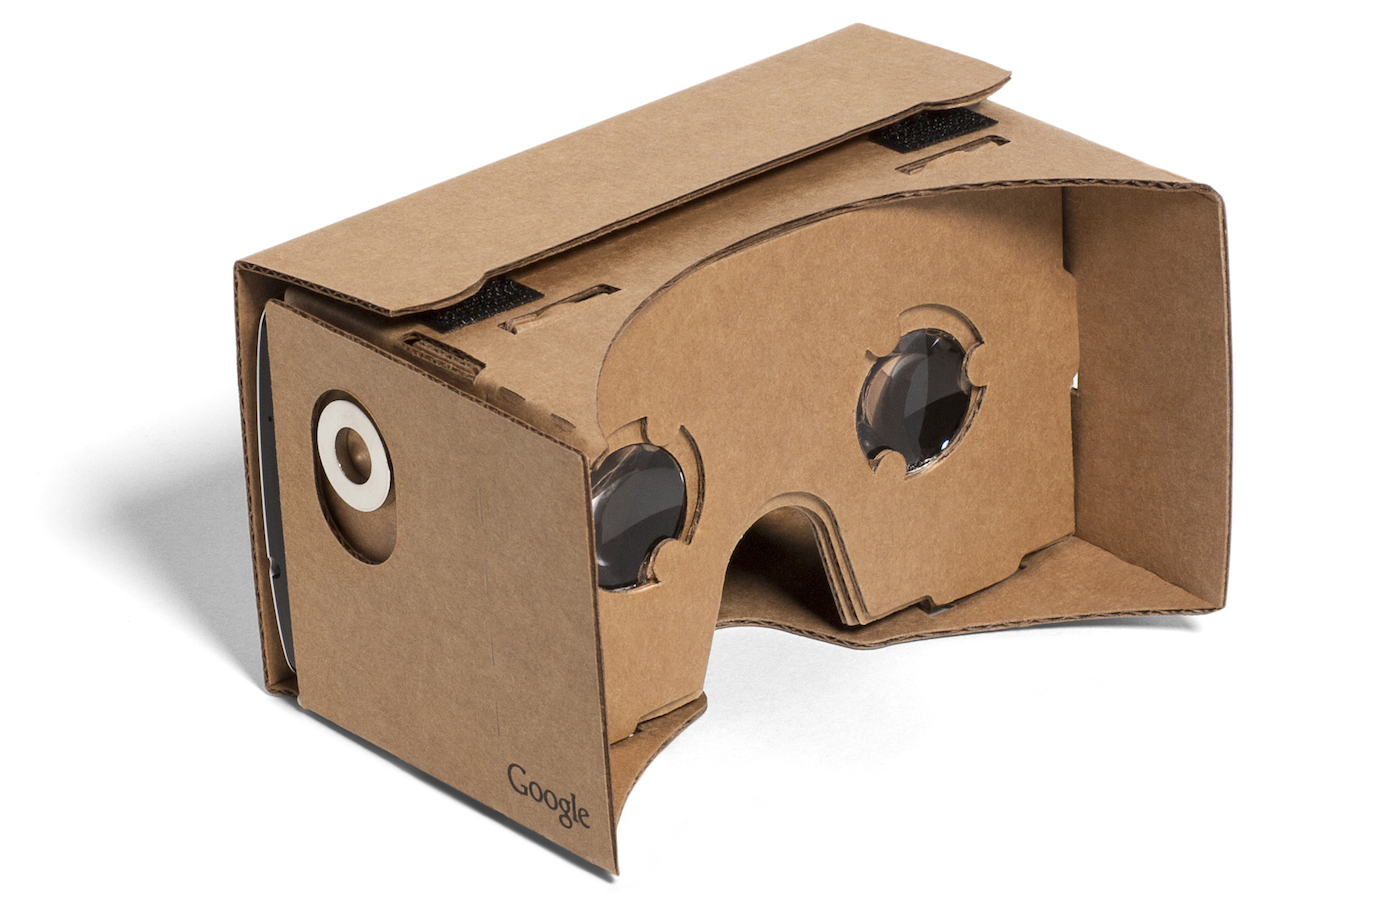 Google Cardboard Image